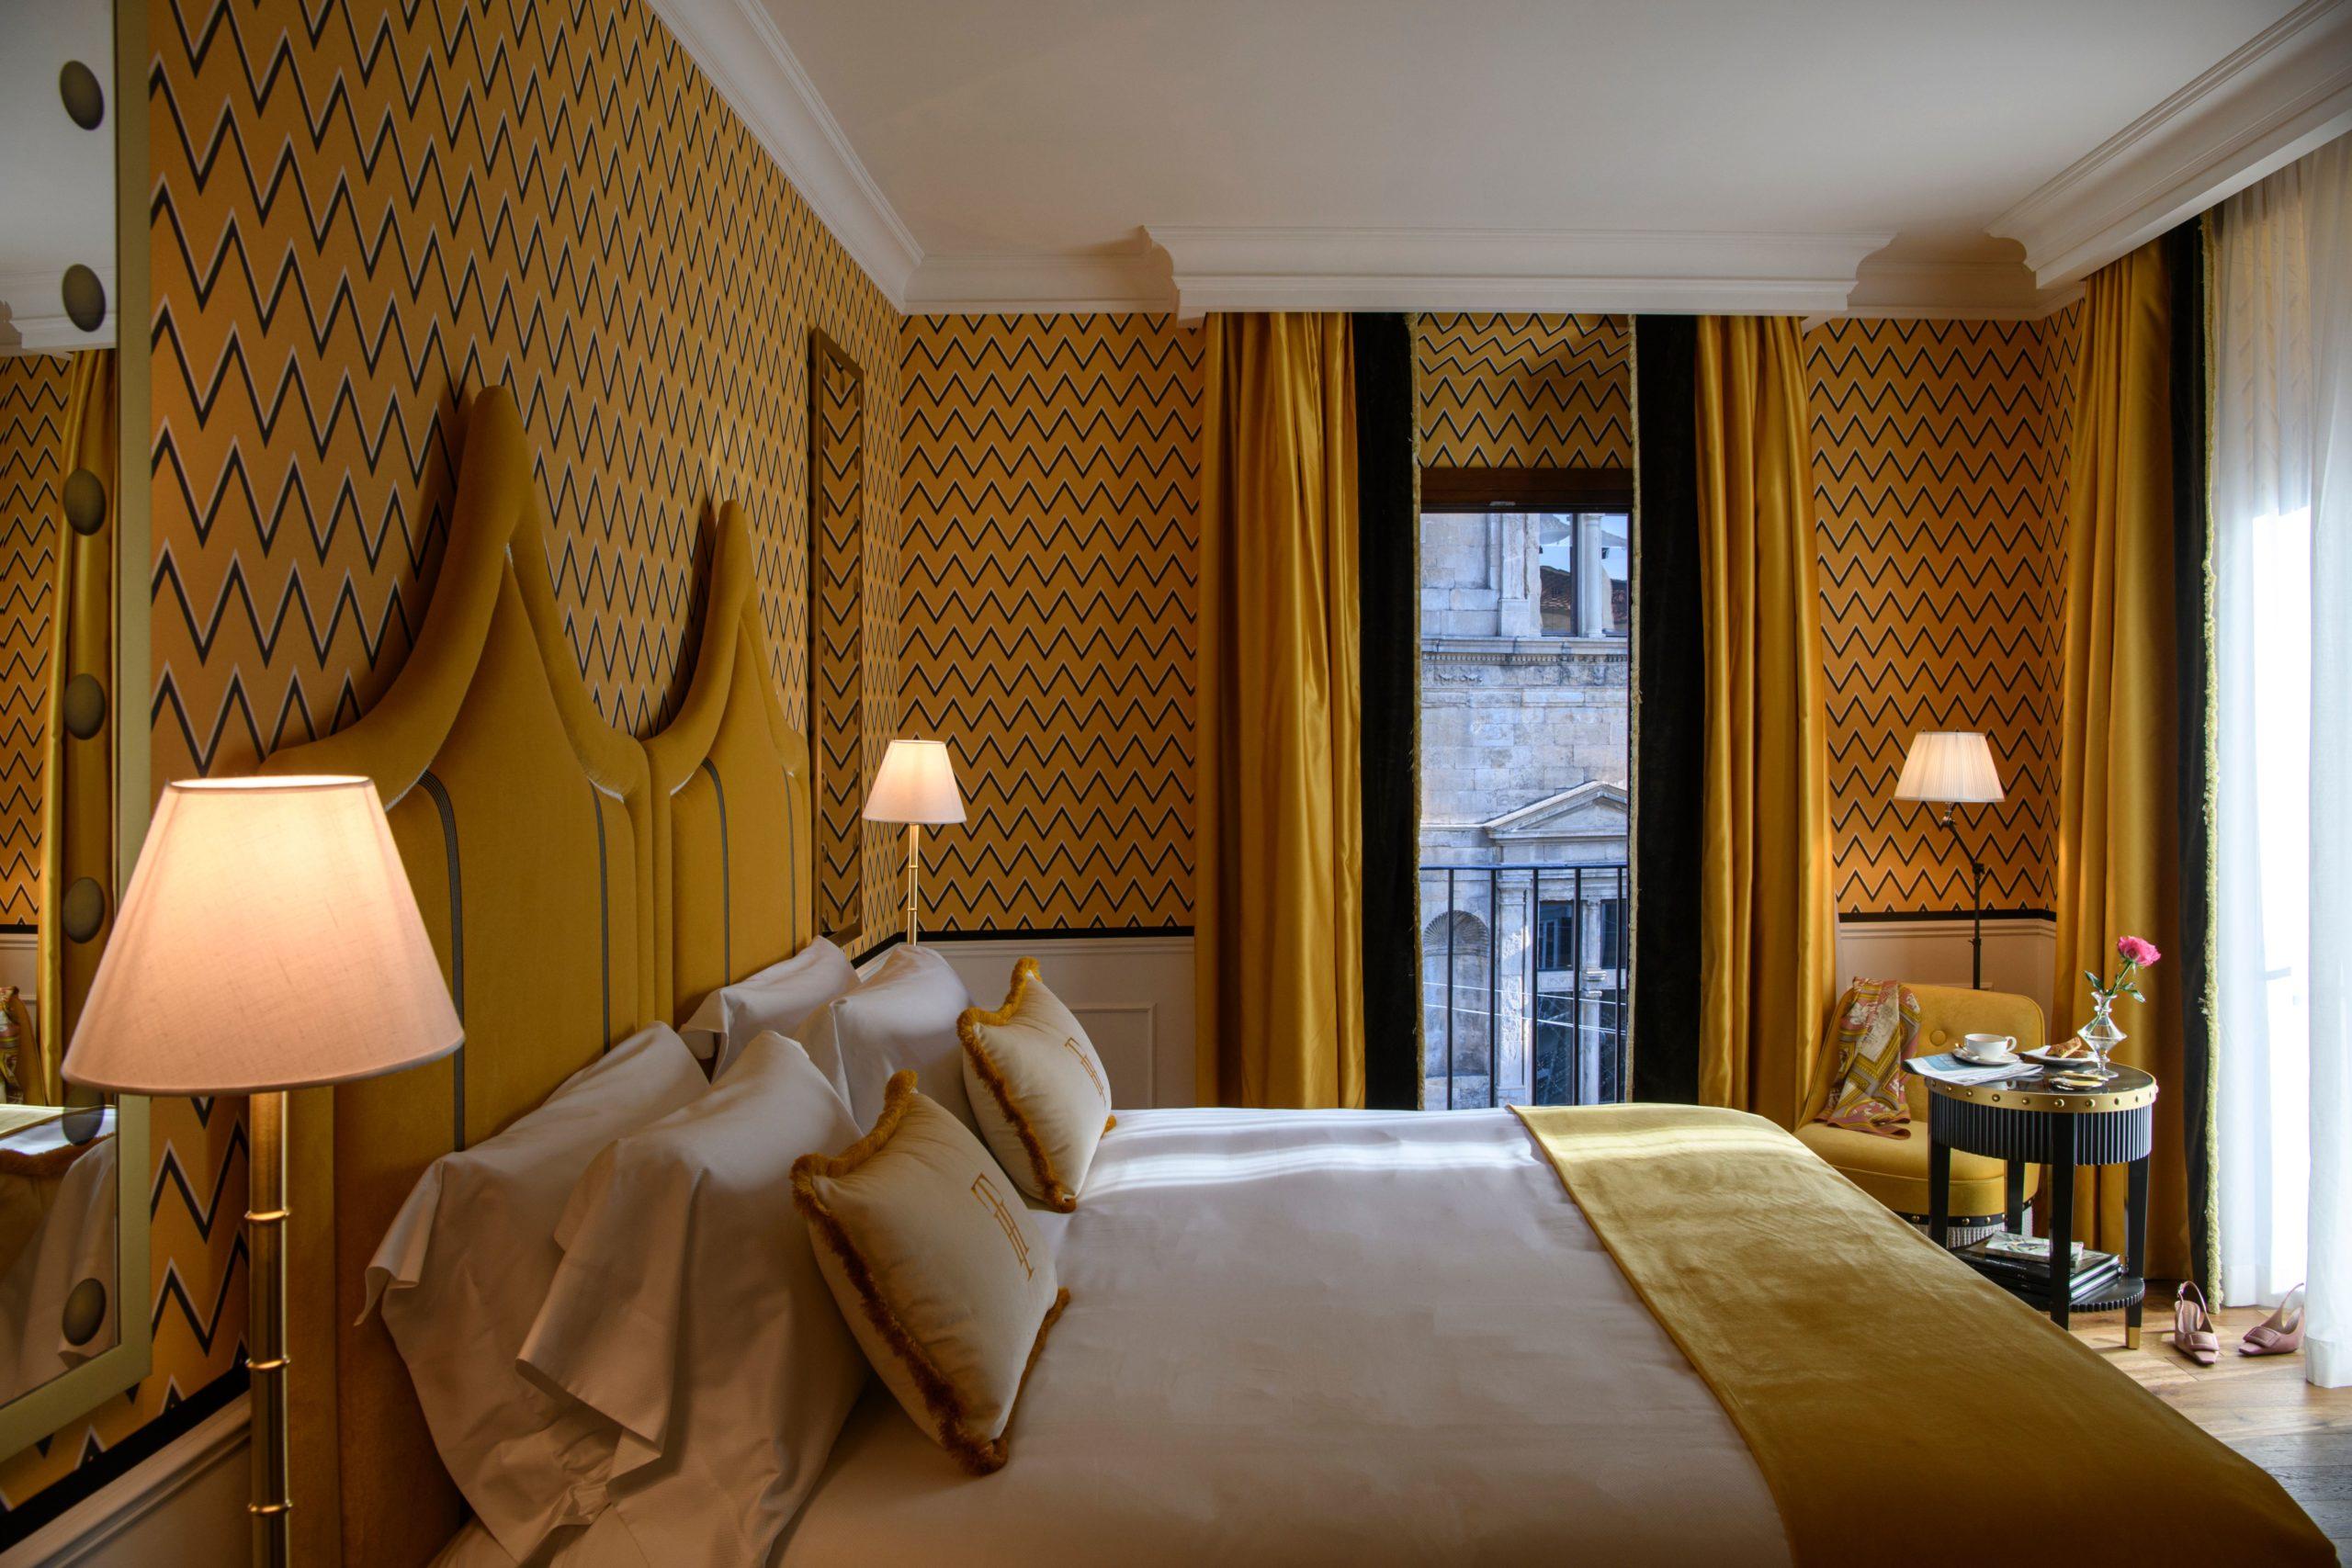 Hyatt Hotel Il Tornabuoni in Florenz